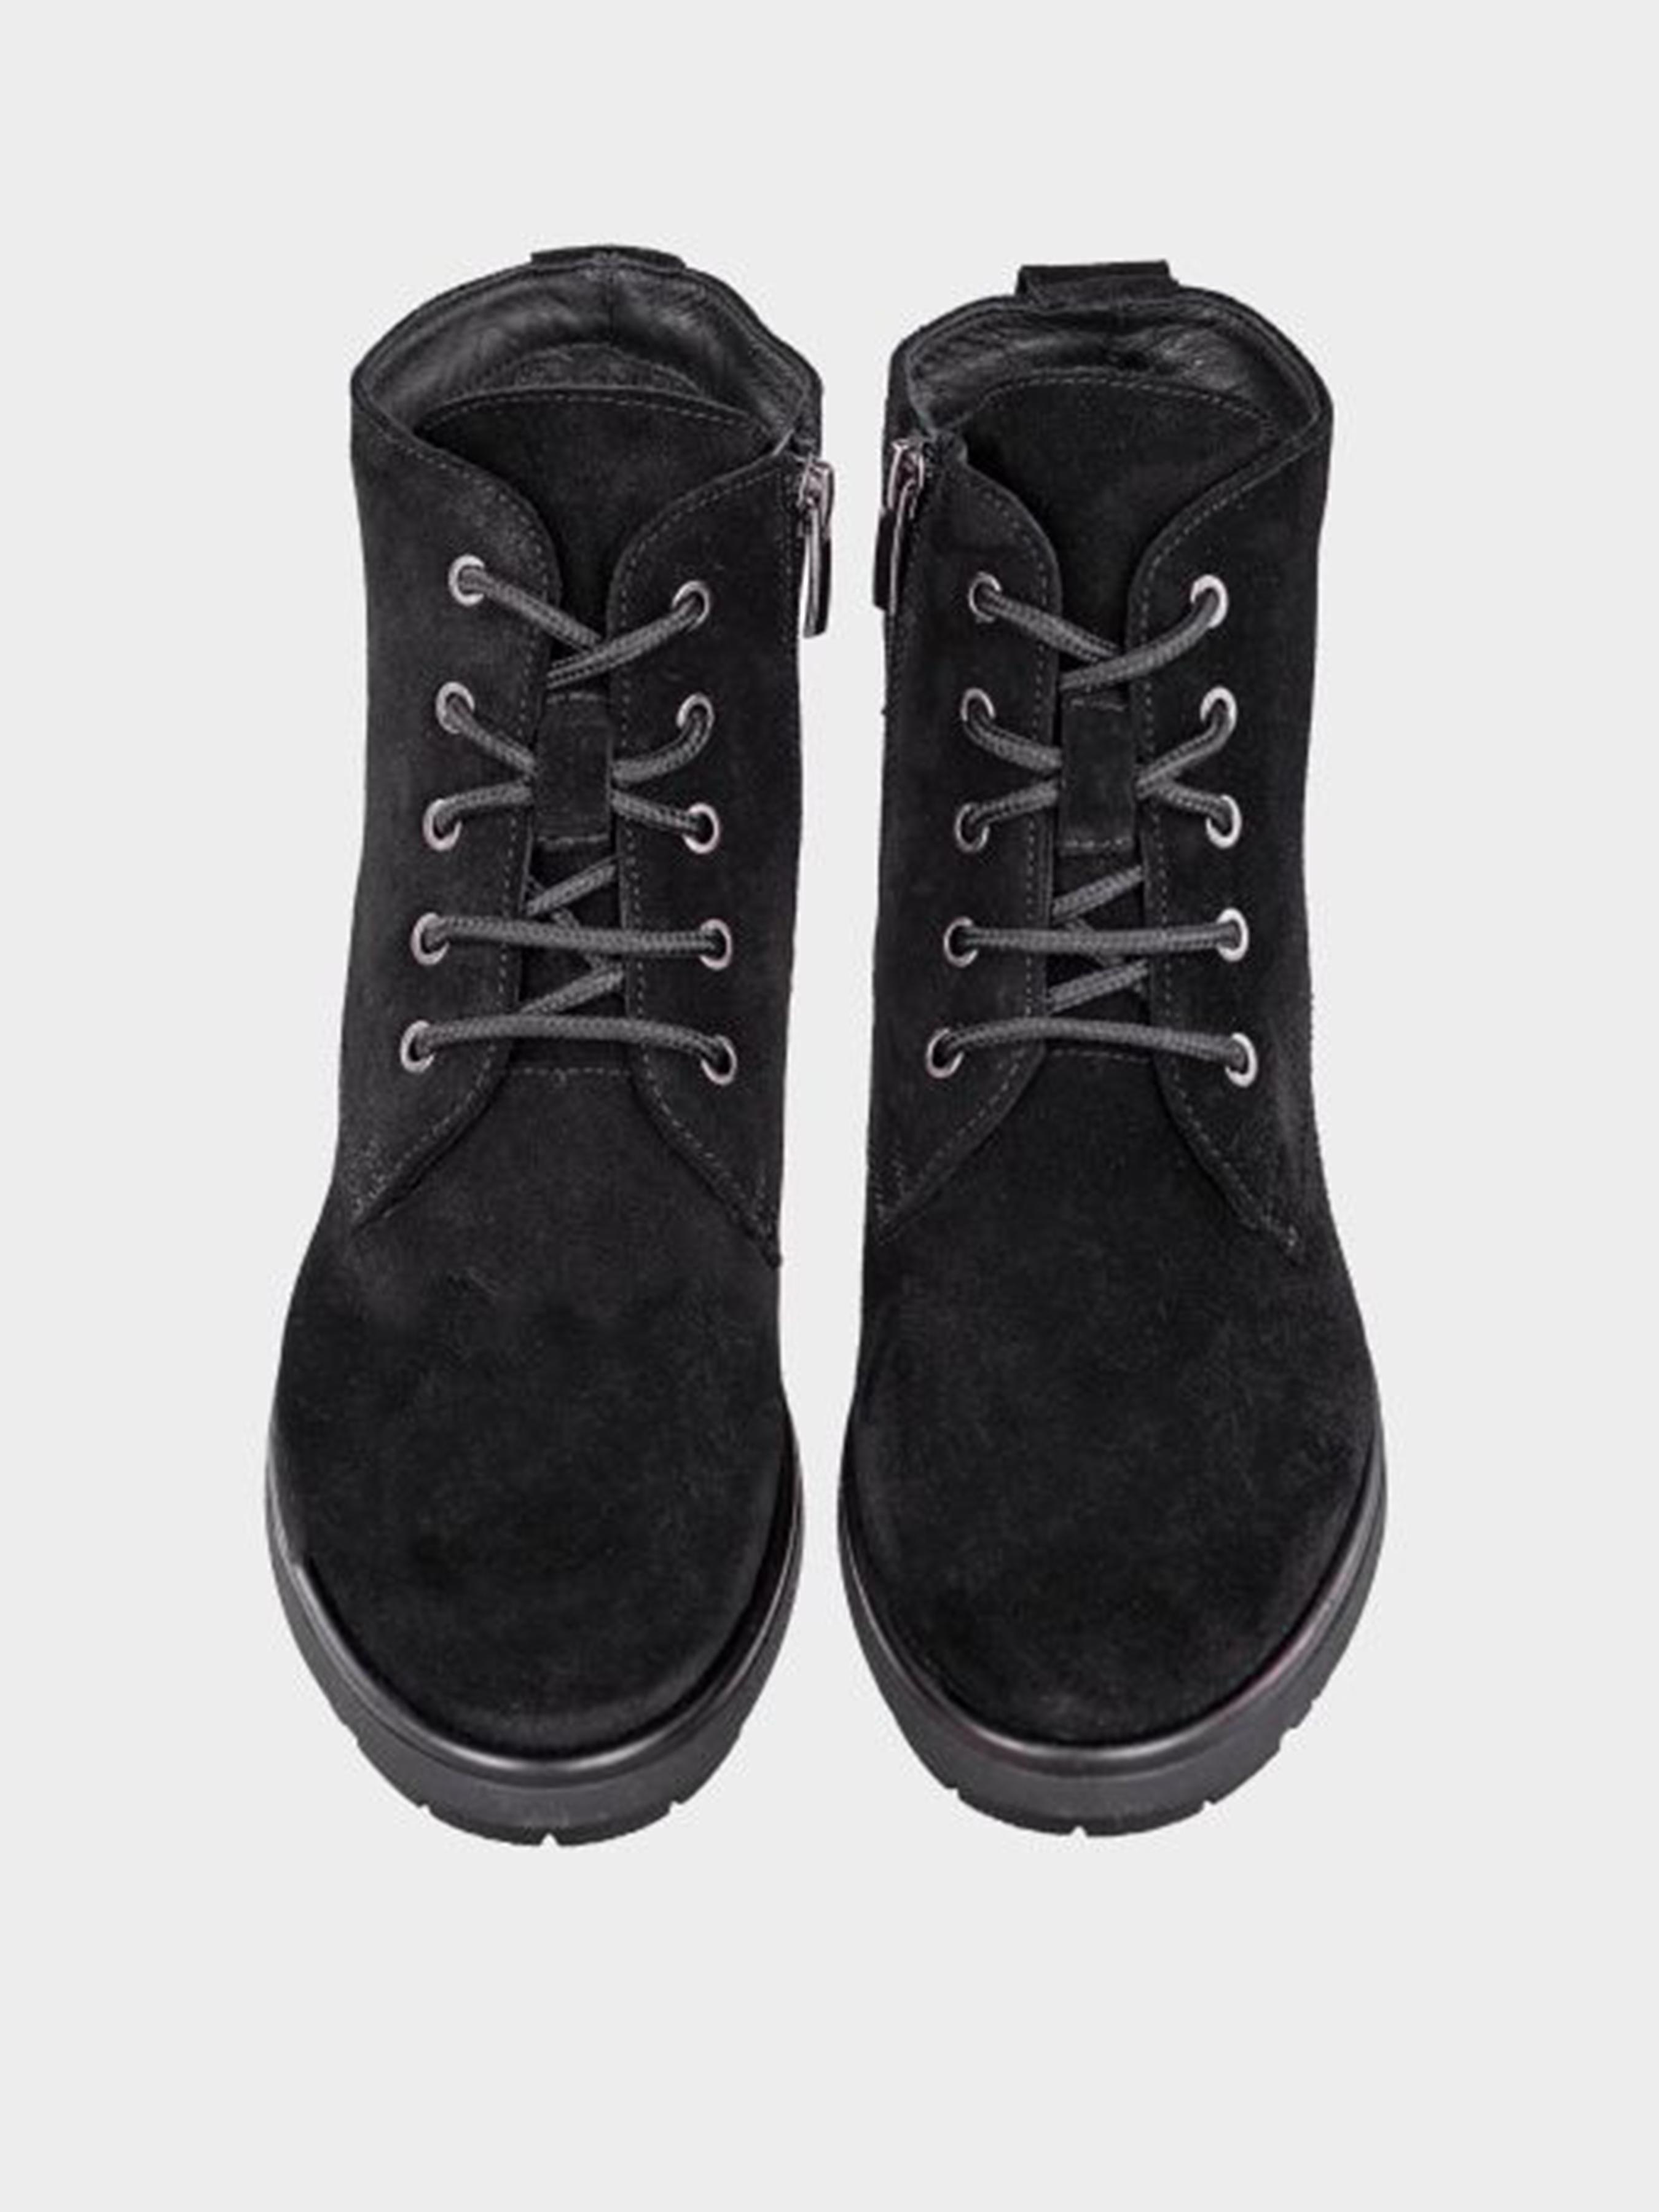 Ботинки для женщин Camalini MIU 0E4 , 2017